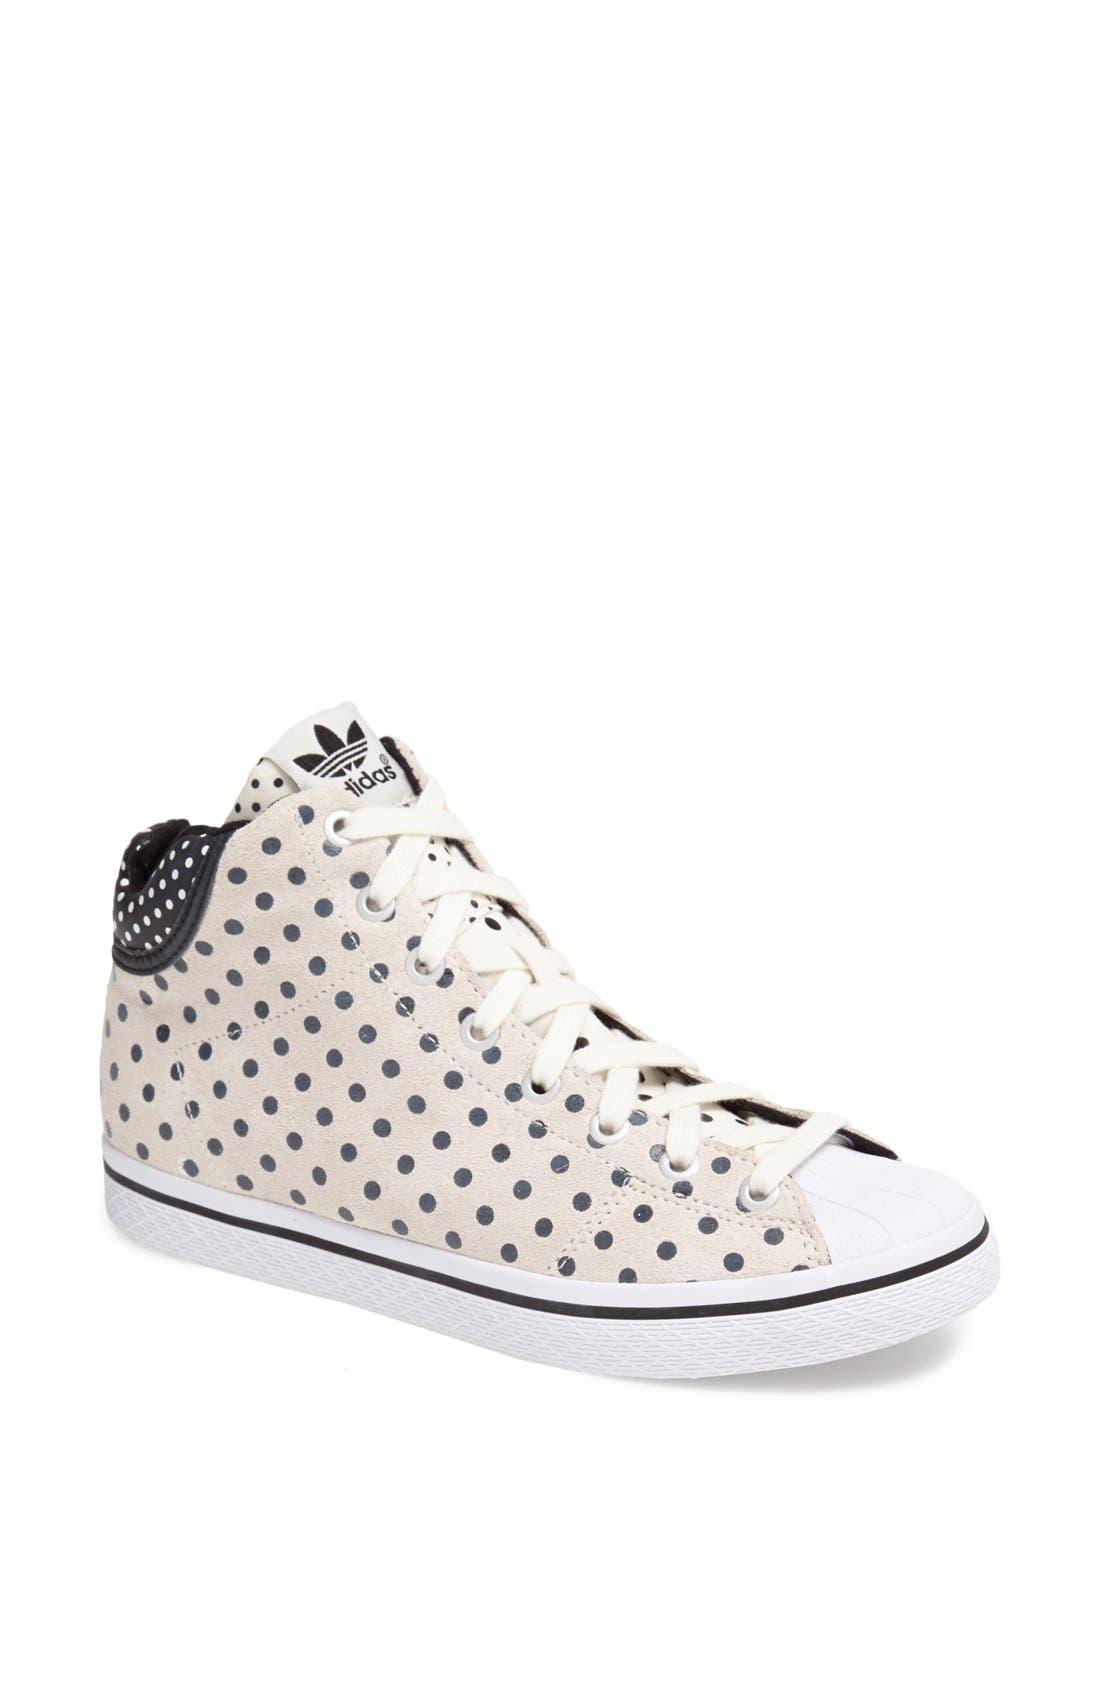 Main Image - adidas 'Star' High Top Sneaker (Women)